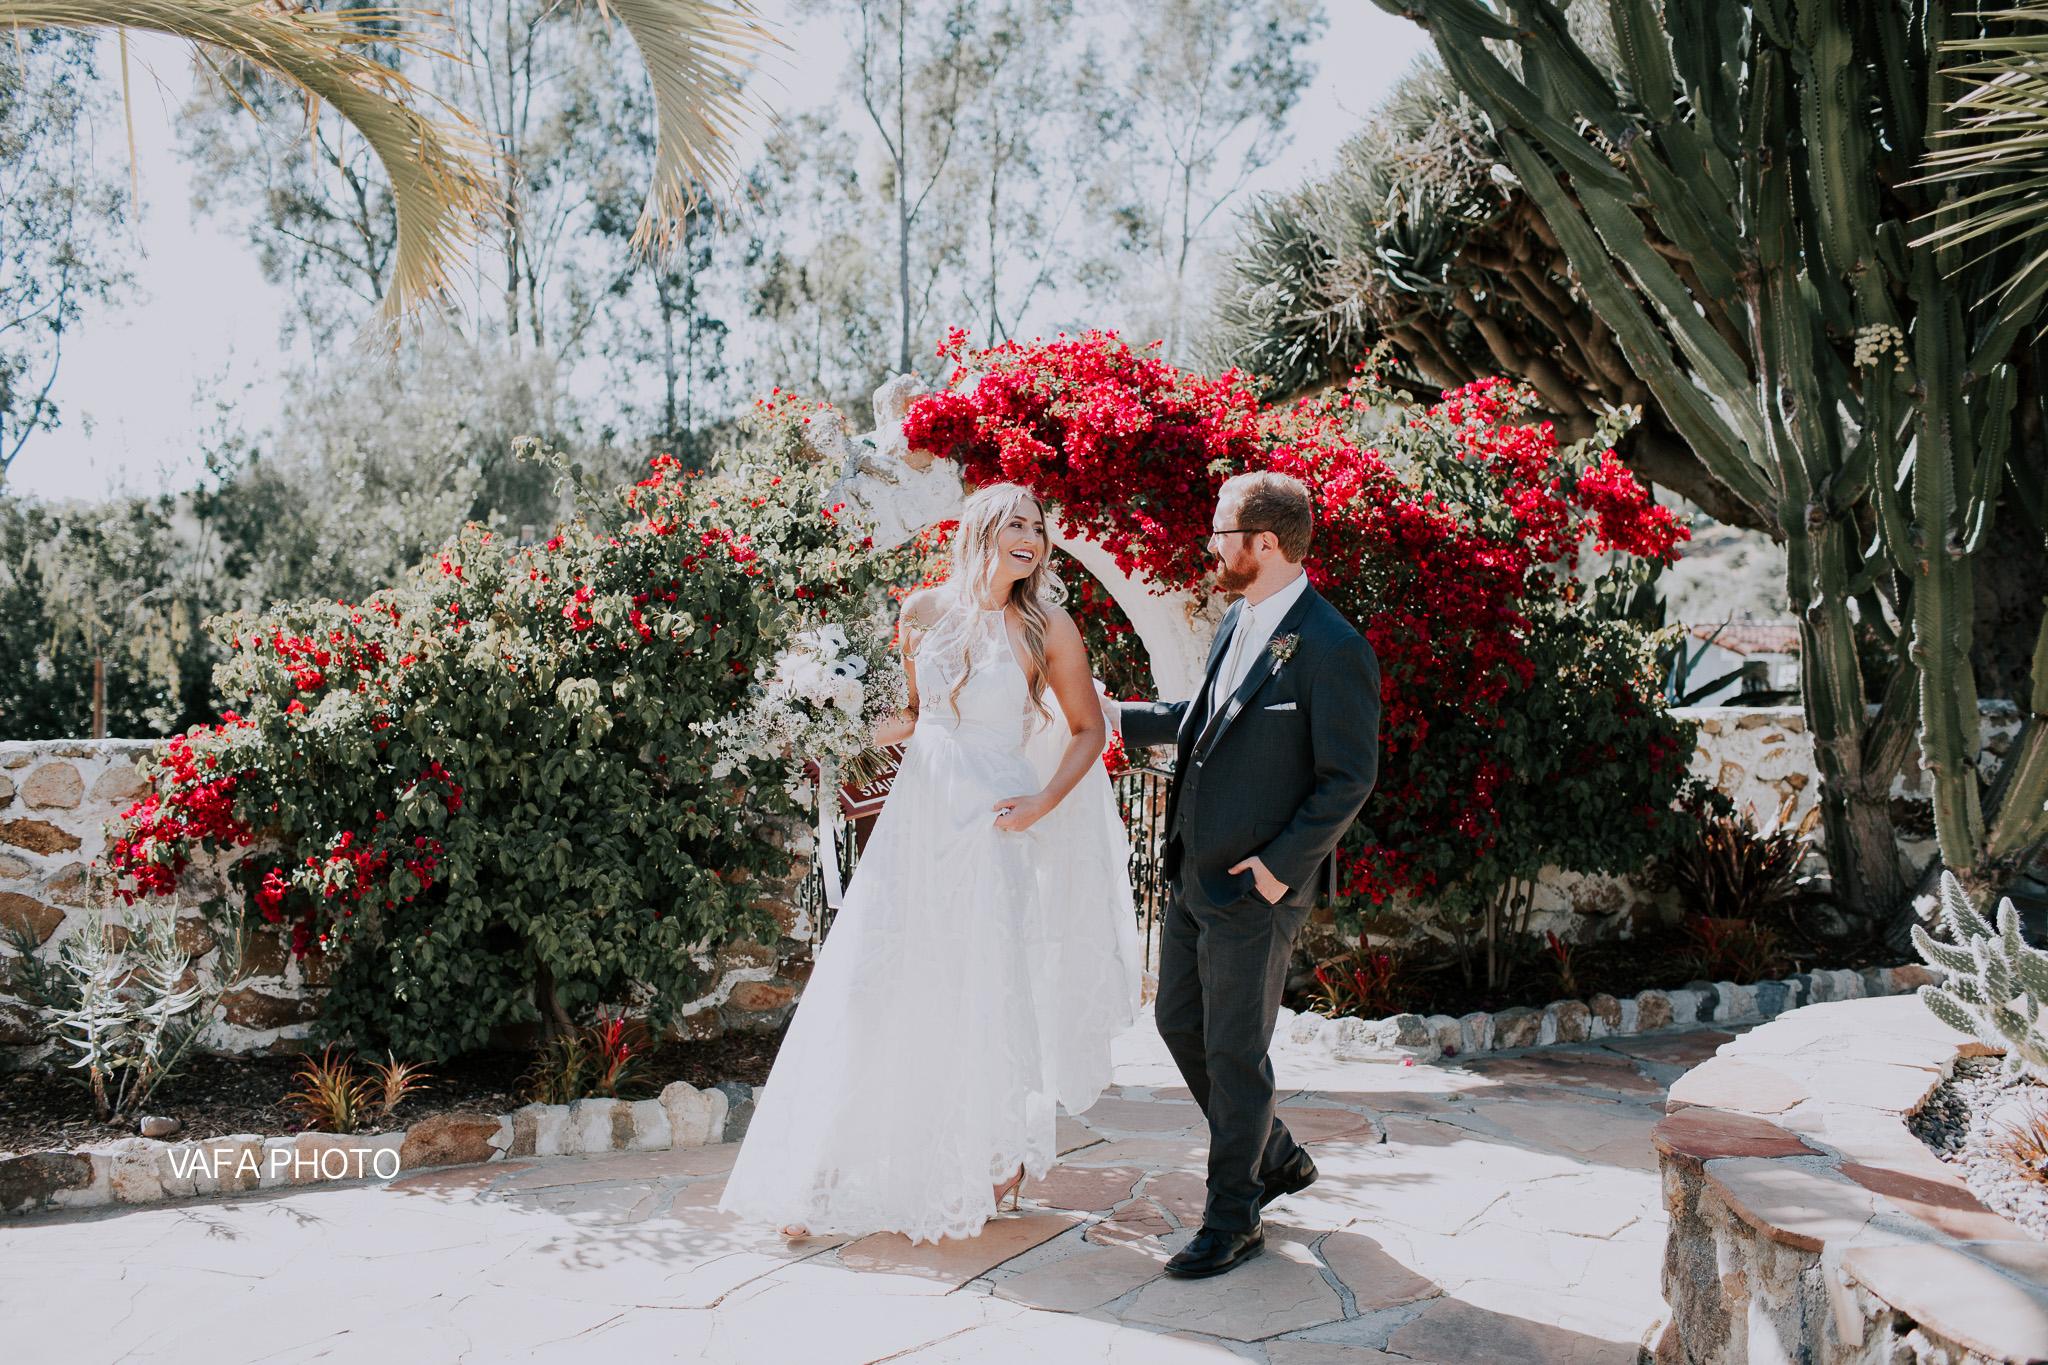 Leo-Carrillo-Ranch-Wedding-Lauren-Mike-Vafa-Photo-305.jpg